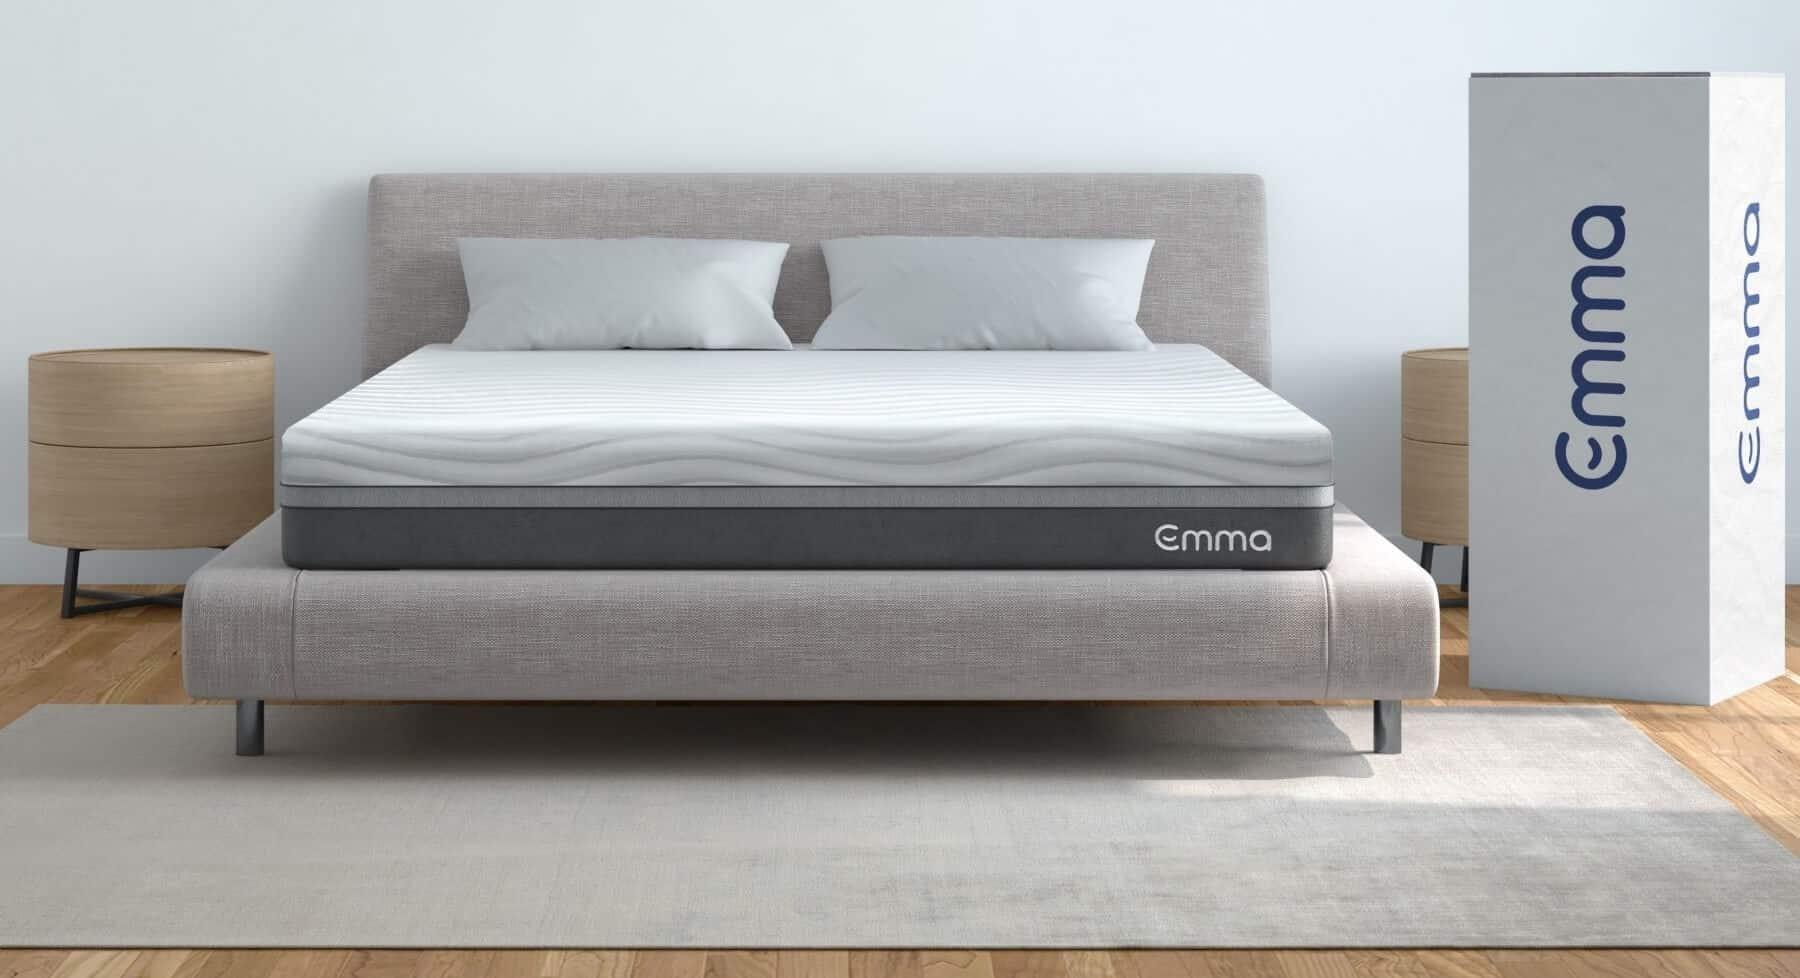 emma sleep review australia